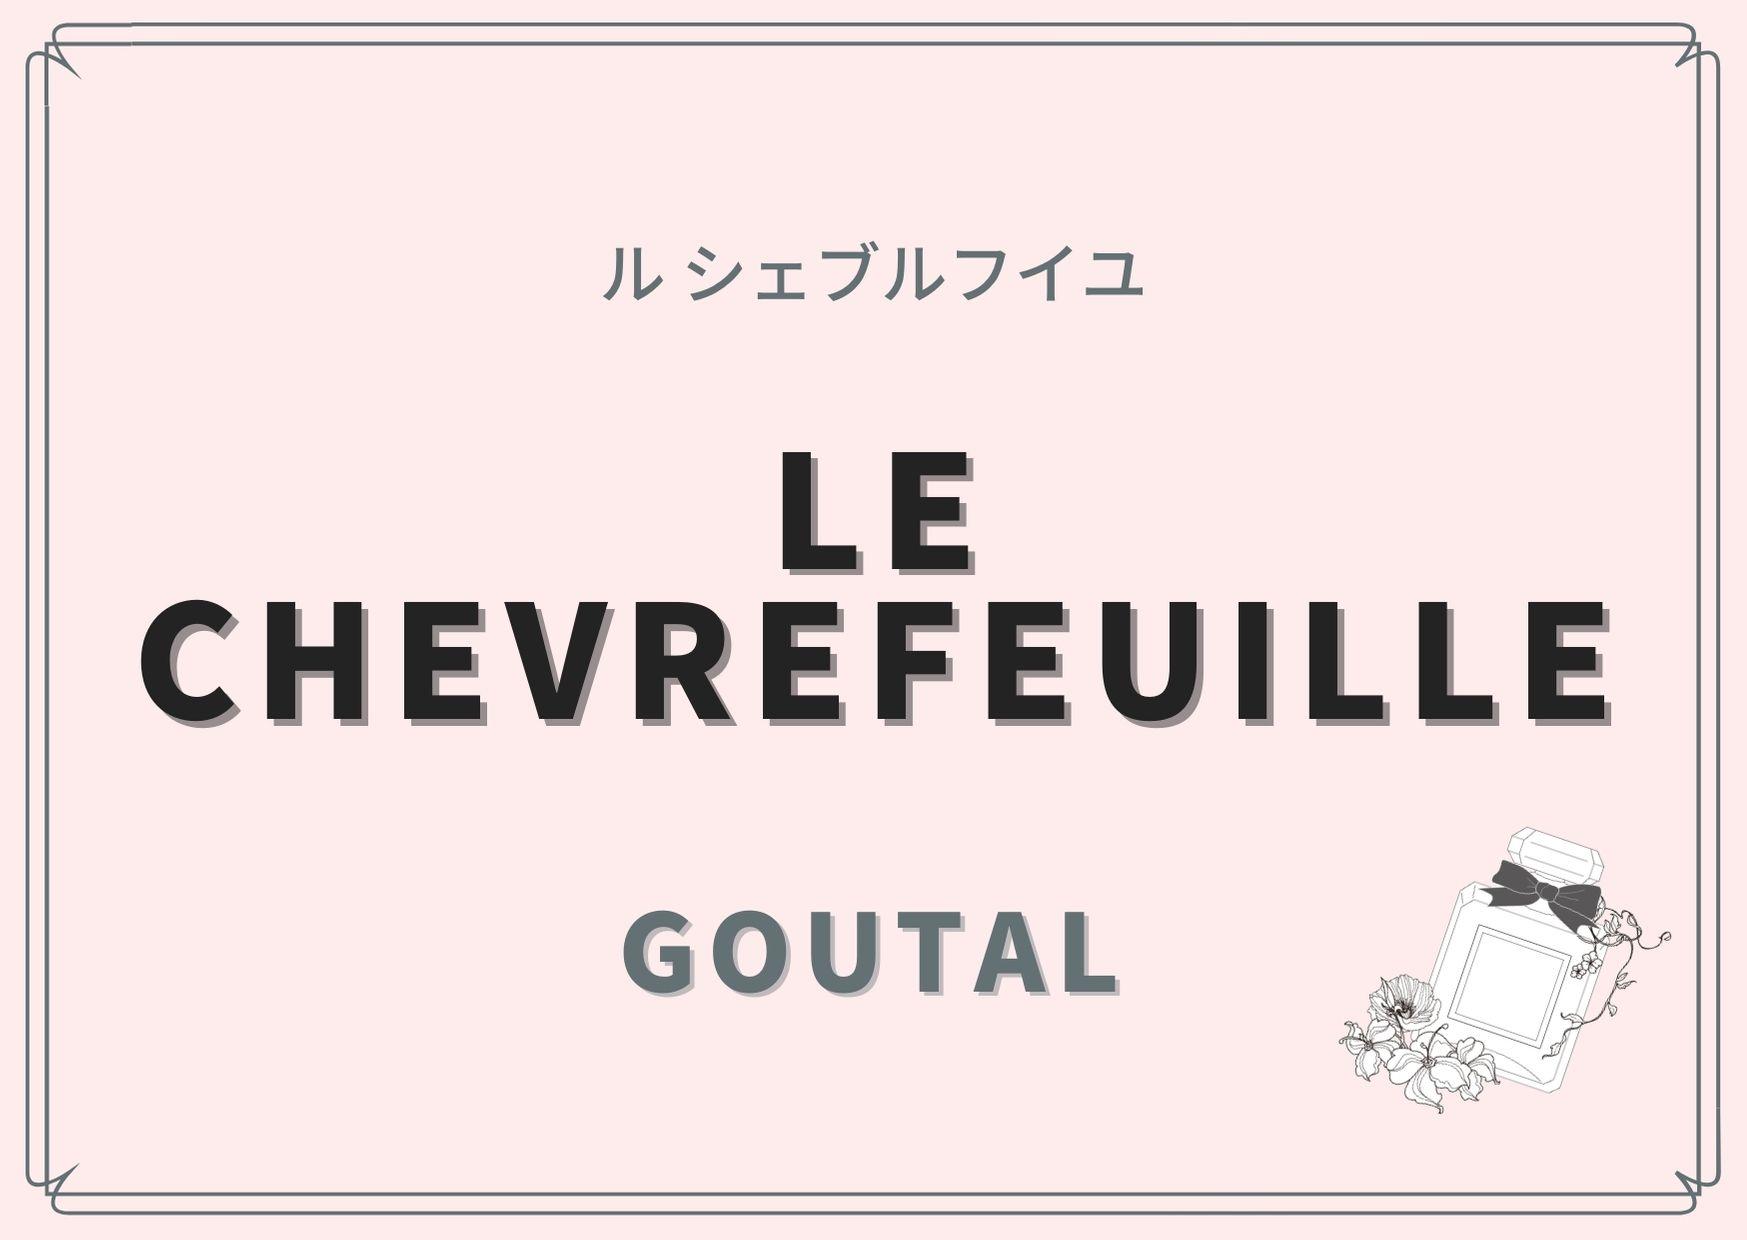 Le Chevrefeuille(ル シェブルフイユ)/ANNICK GOUTAL(アニック グタール)